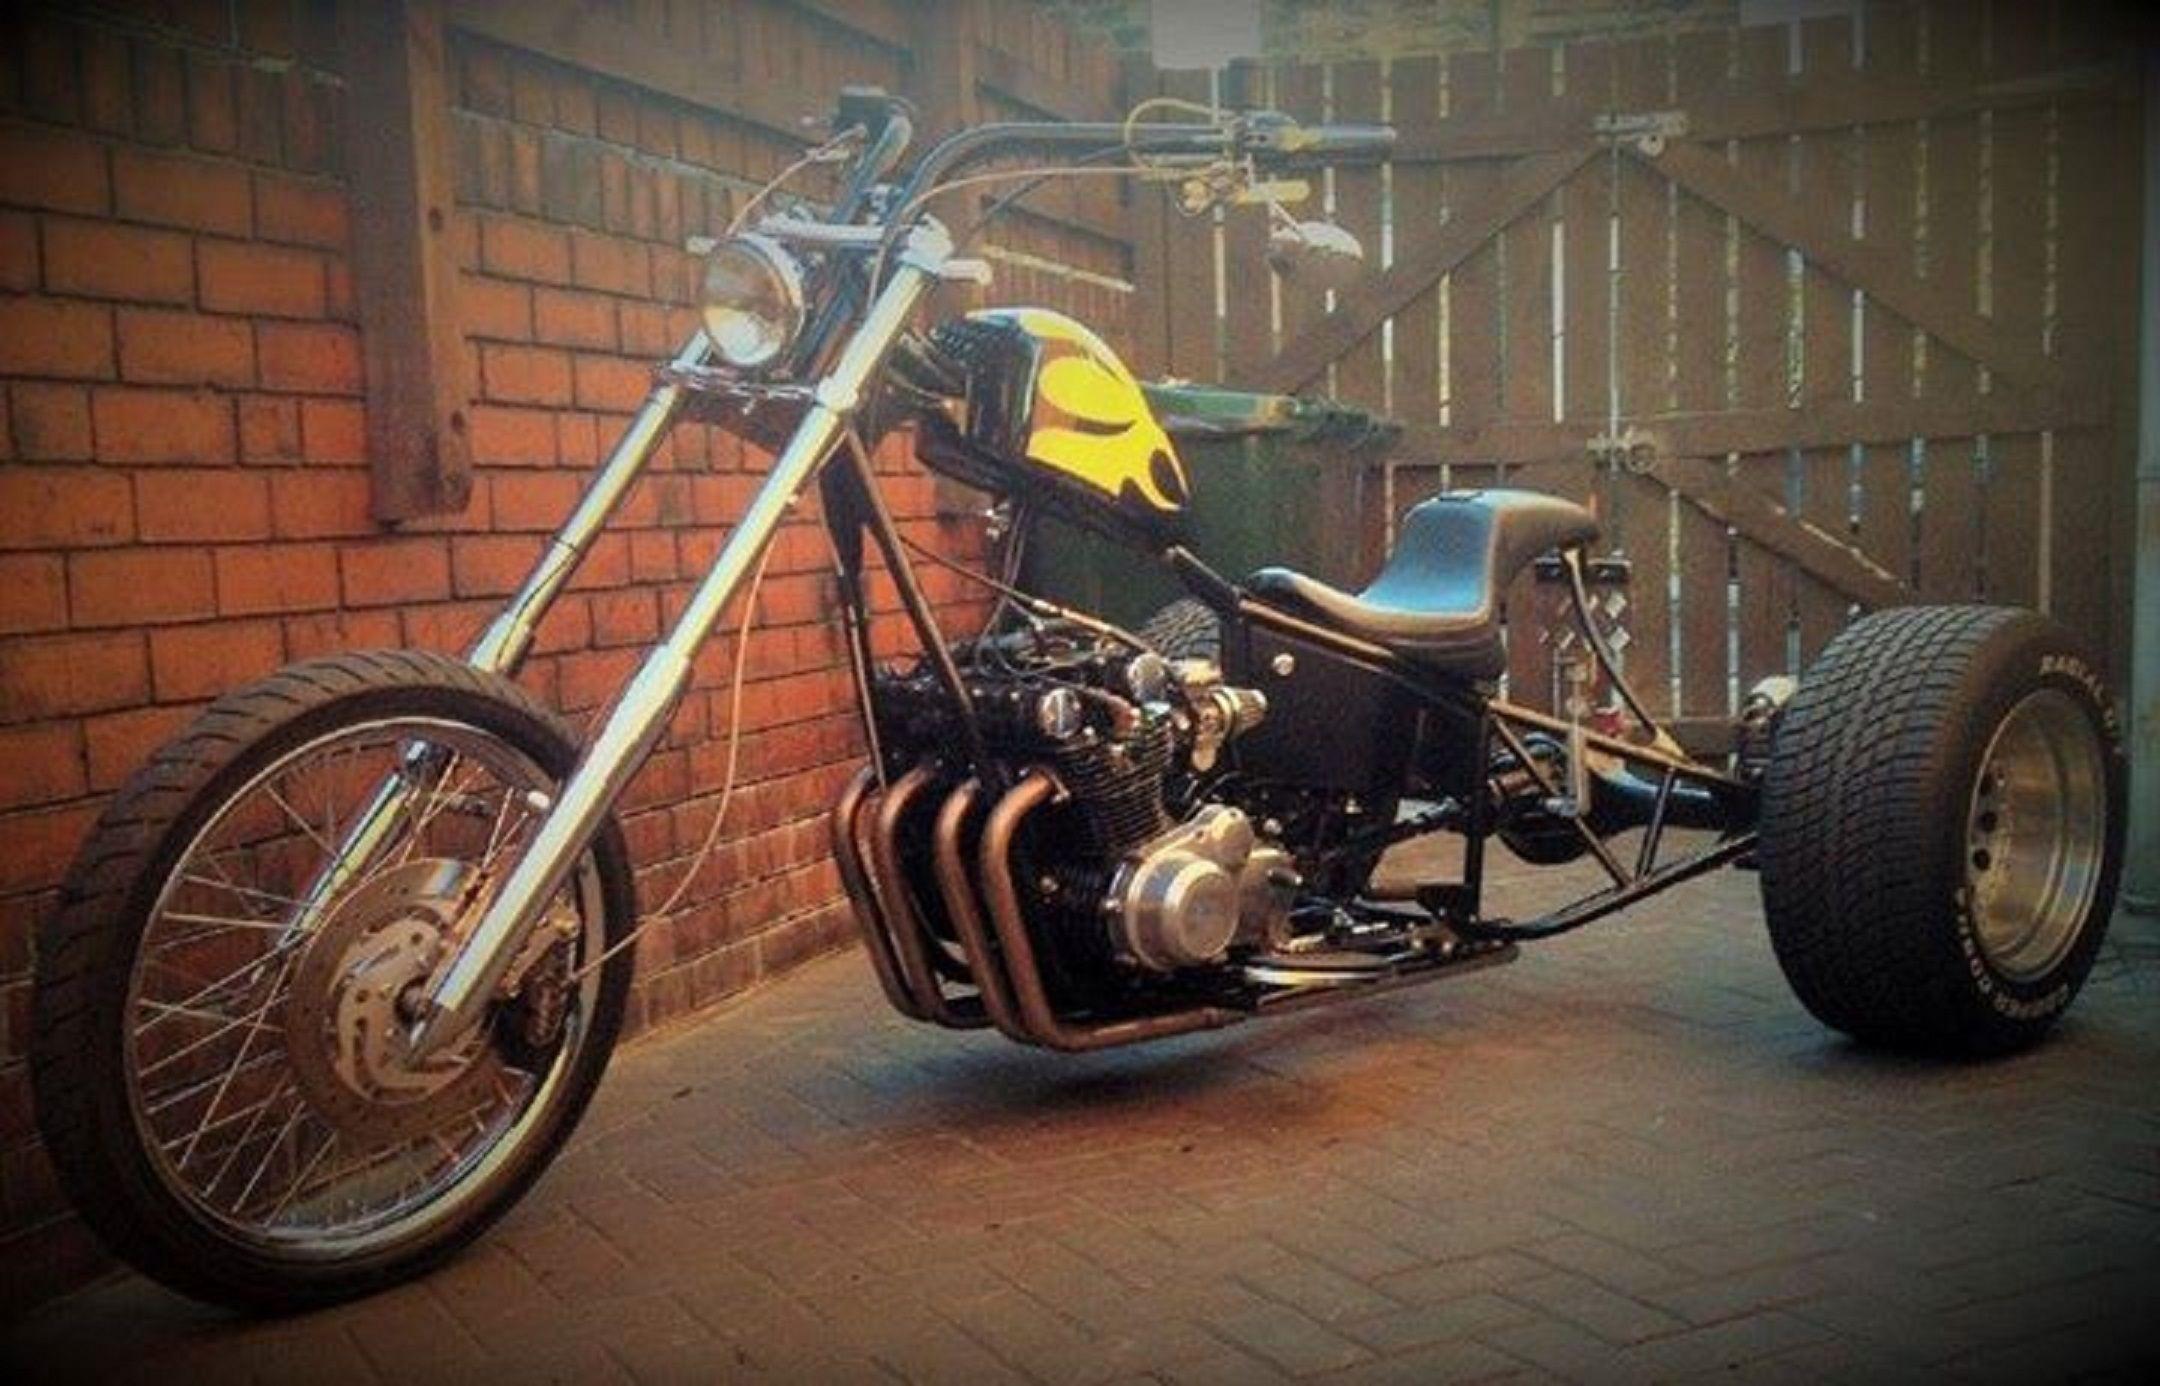 Suzuki gs850 hardtail trike recently being auctioned on ebay item location barnsley